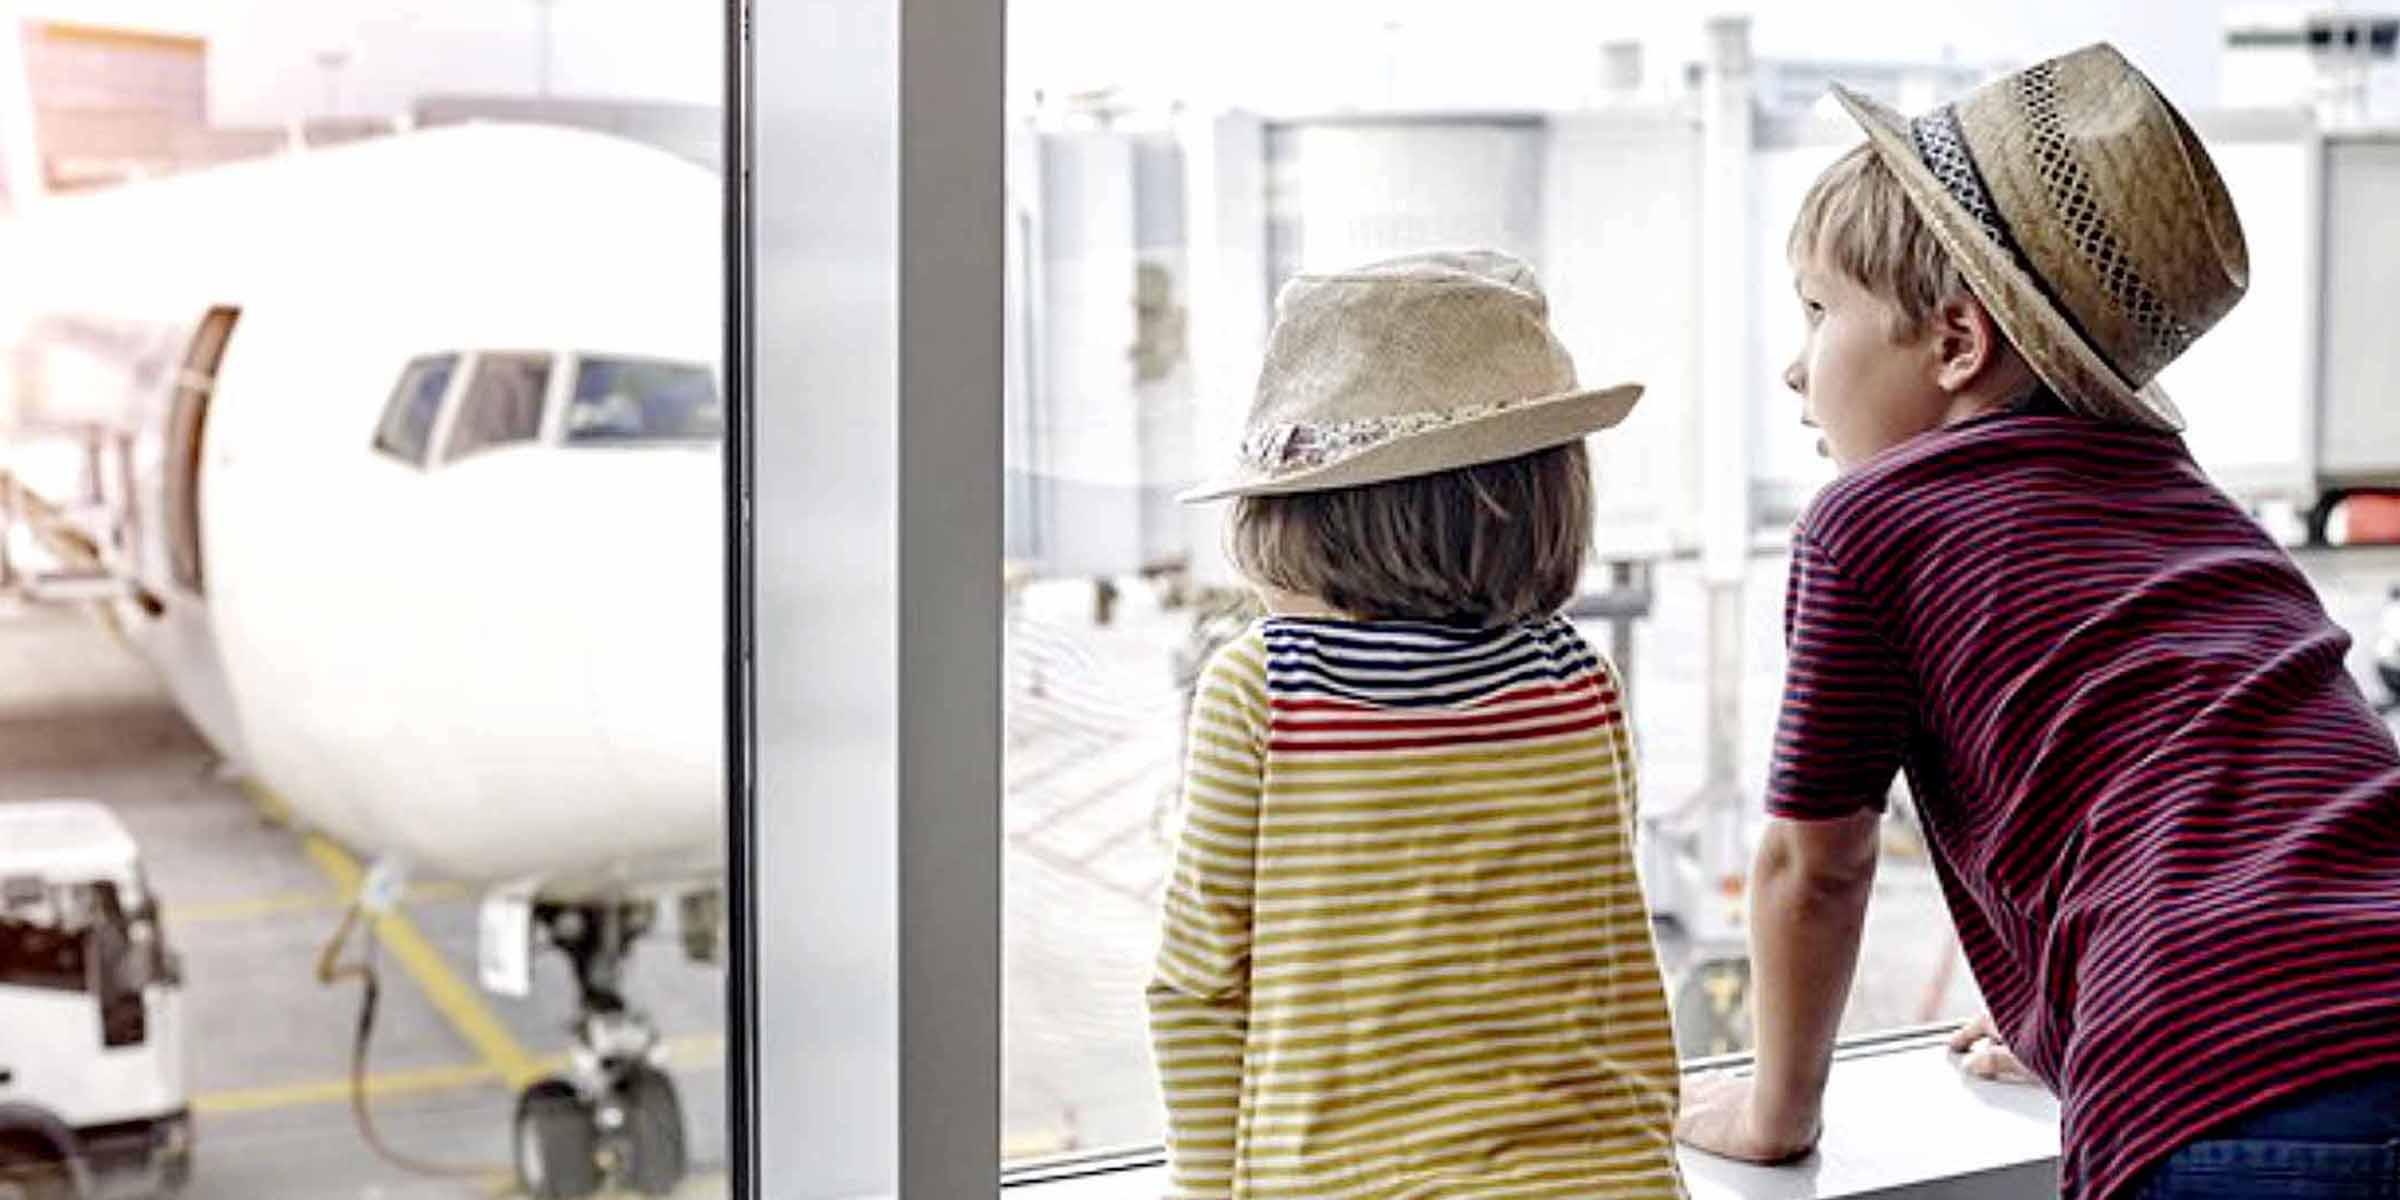 SAIL THROUGH TSA SECURITY – HAVE THE RIGHT BAG